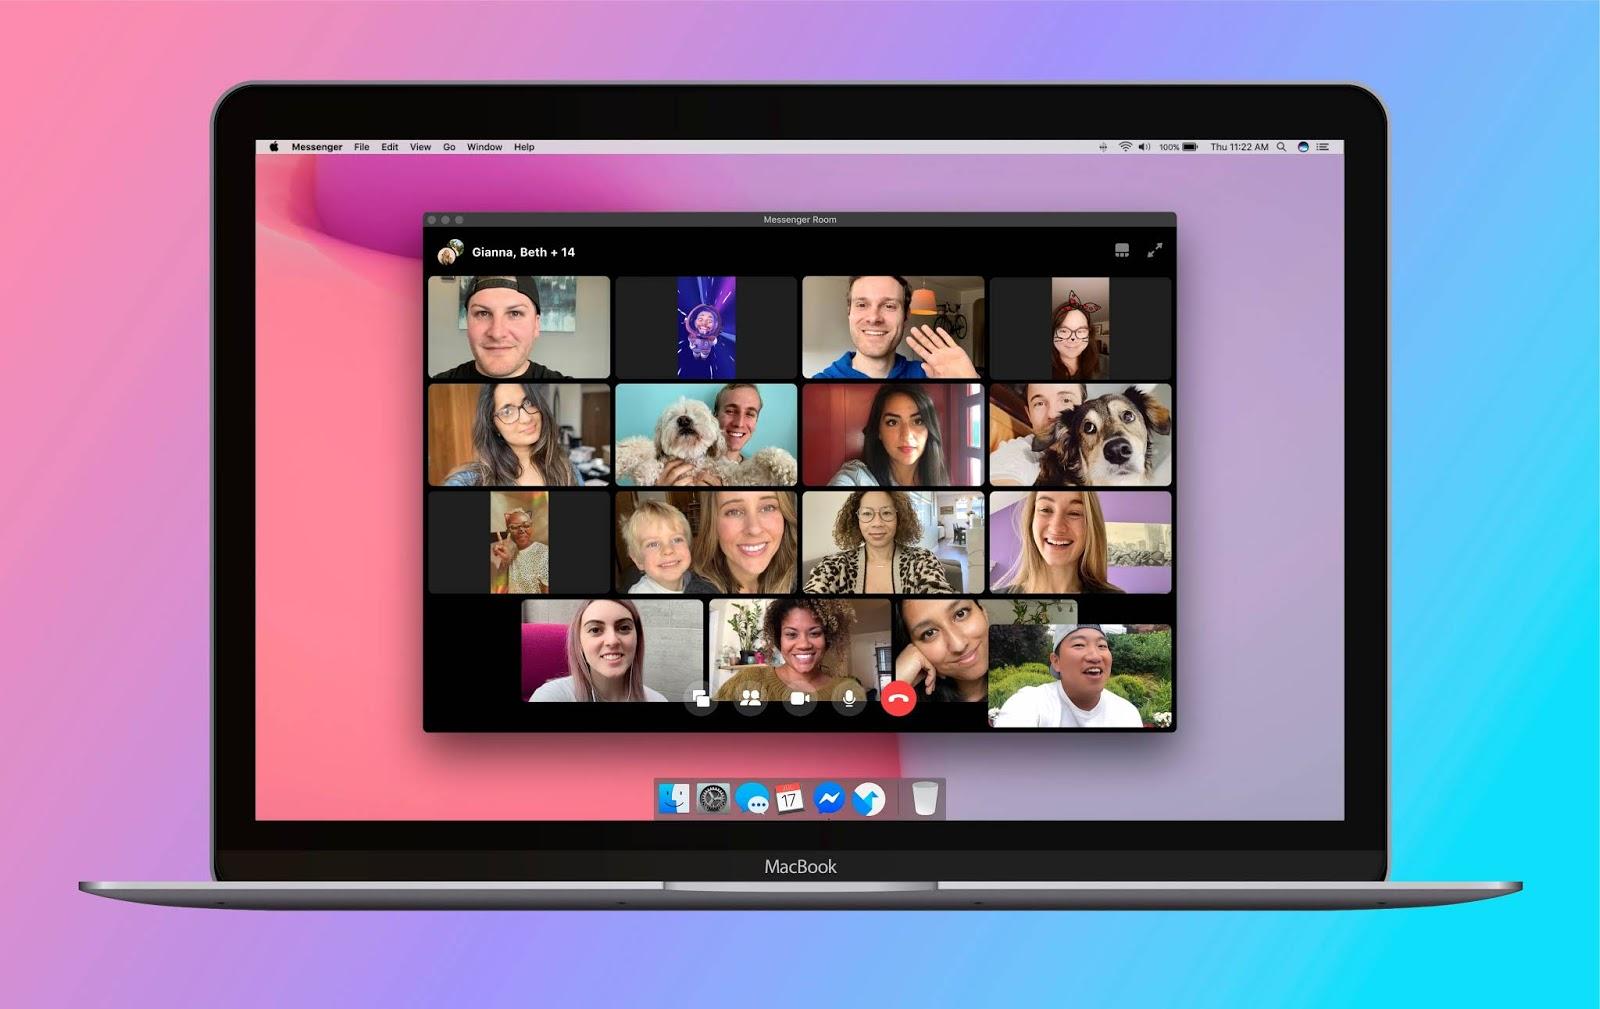 [E non solo] Facebook annuncia Messenger Rooms, videoconferenze fino a 50 partecipanti | Video